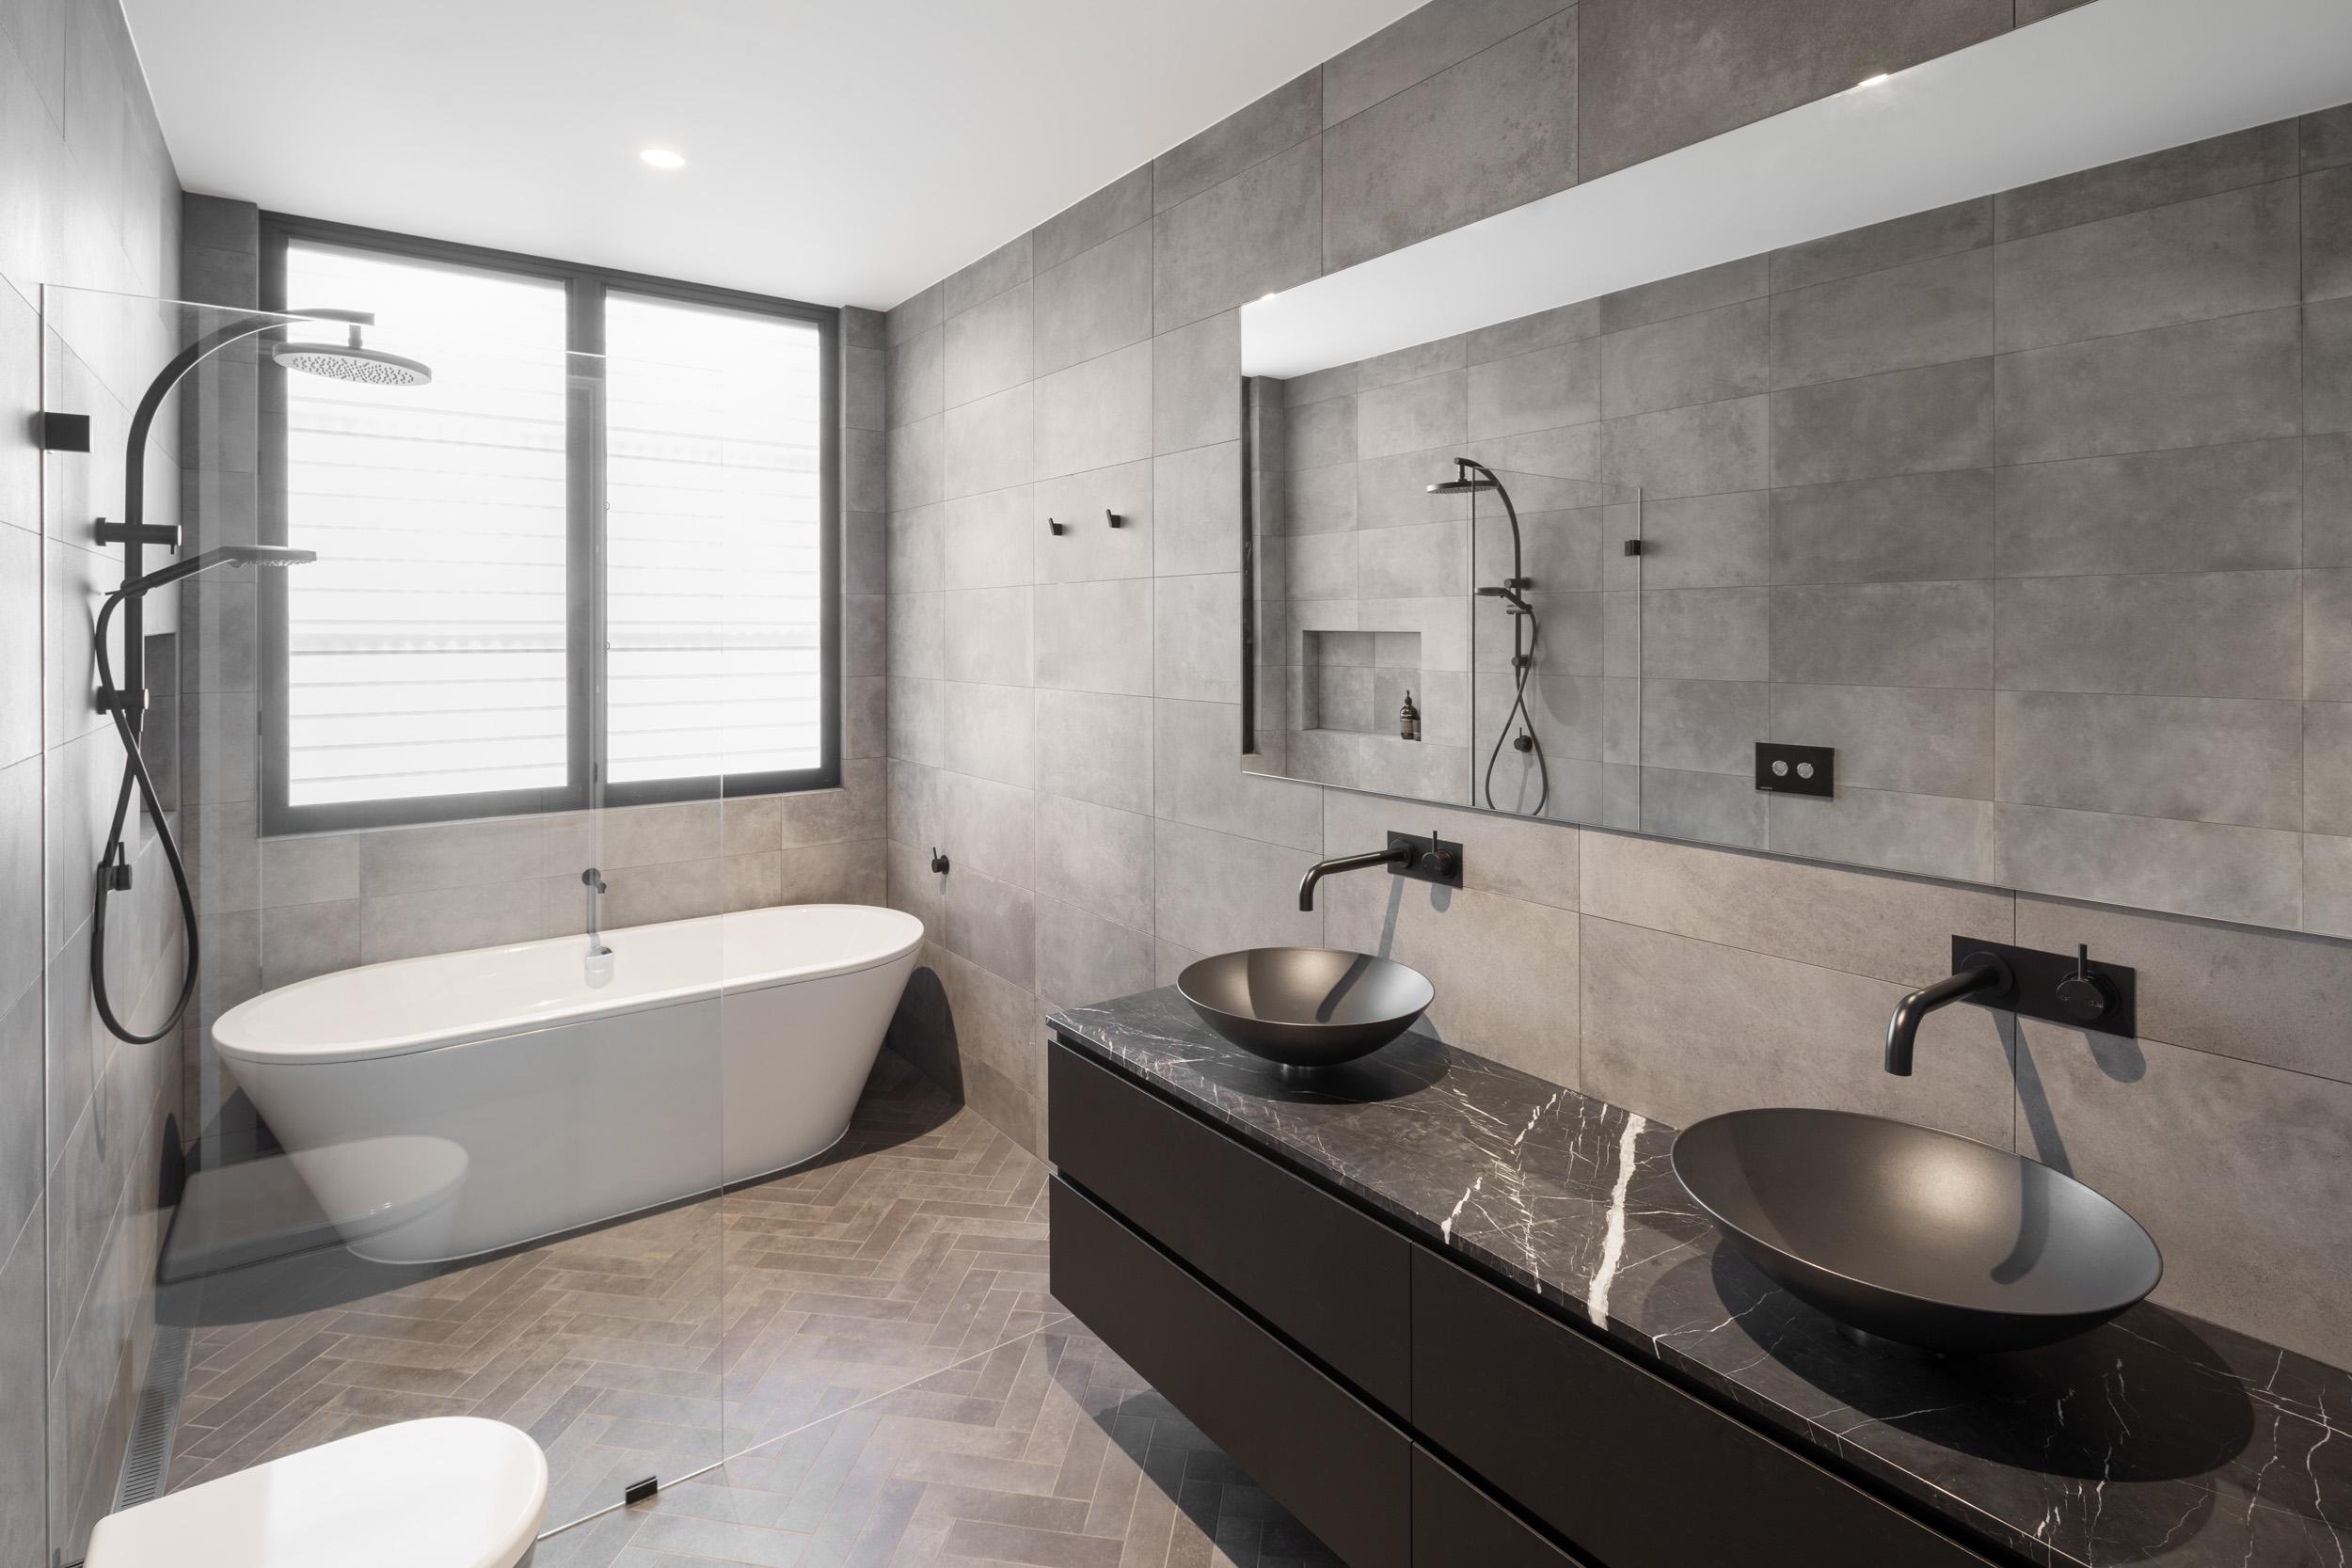 Jem_Cresswell_Architecture_Residential_Photographer_Sydney_Australia_026.jpg